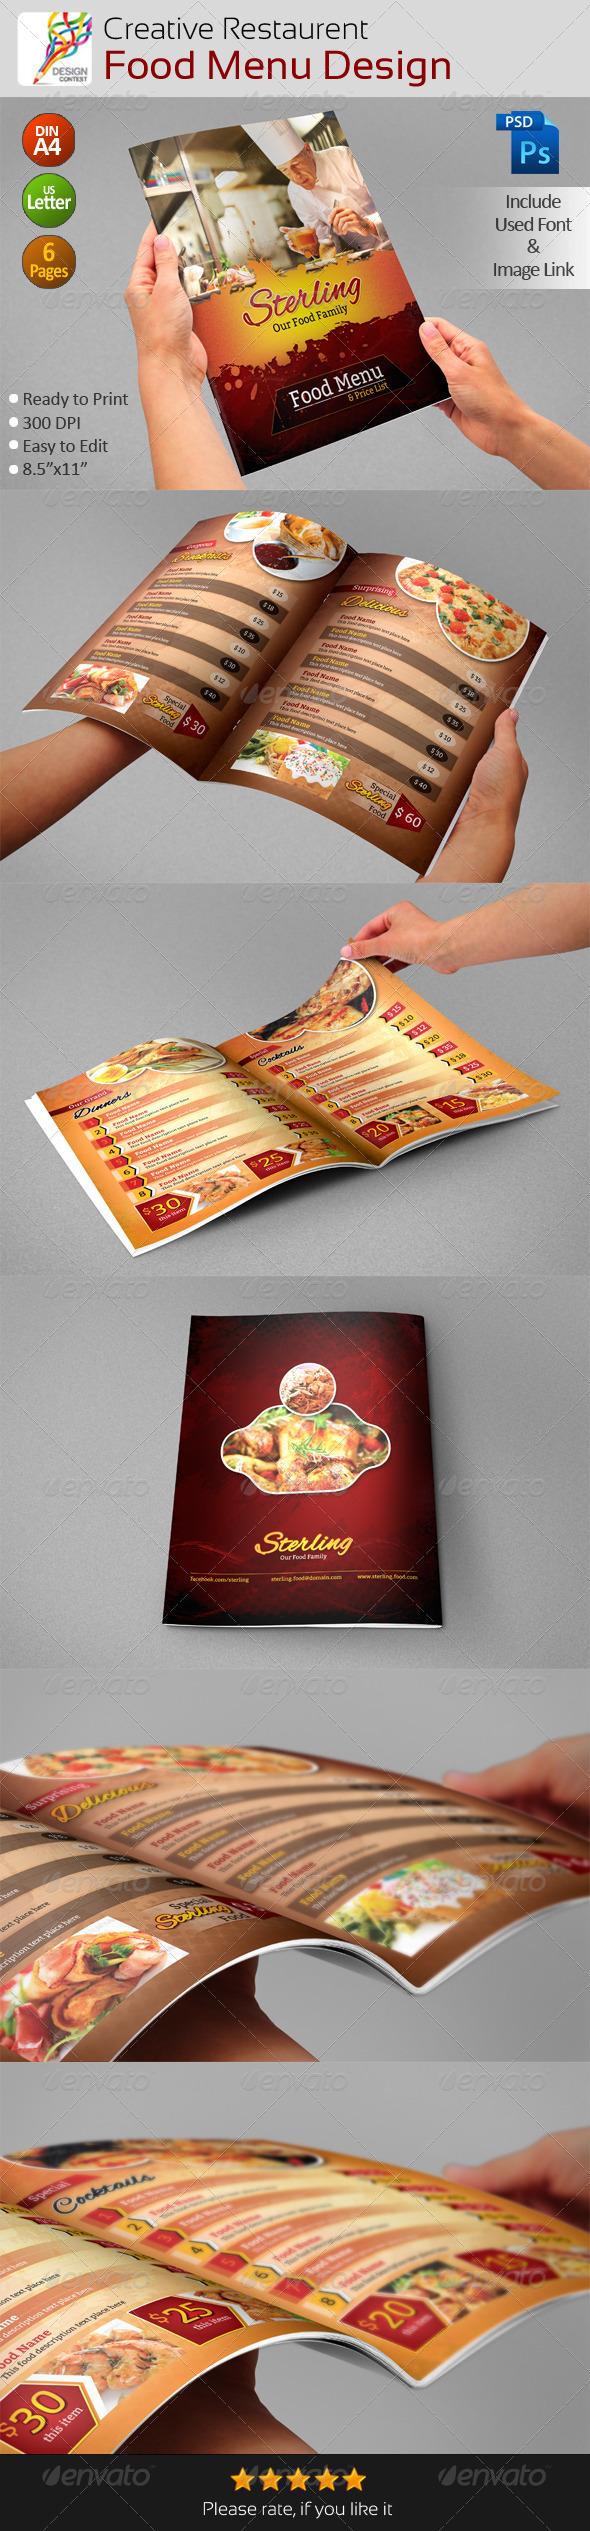 GraphicRiver Creative Restaurent Food Menu Design 5134151